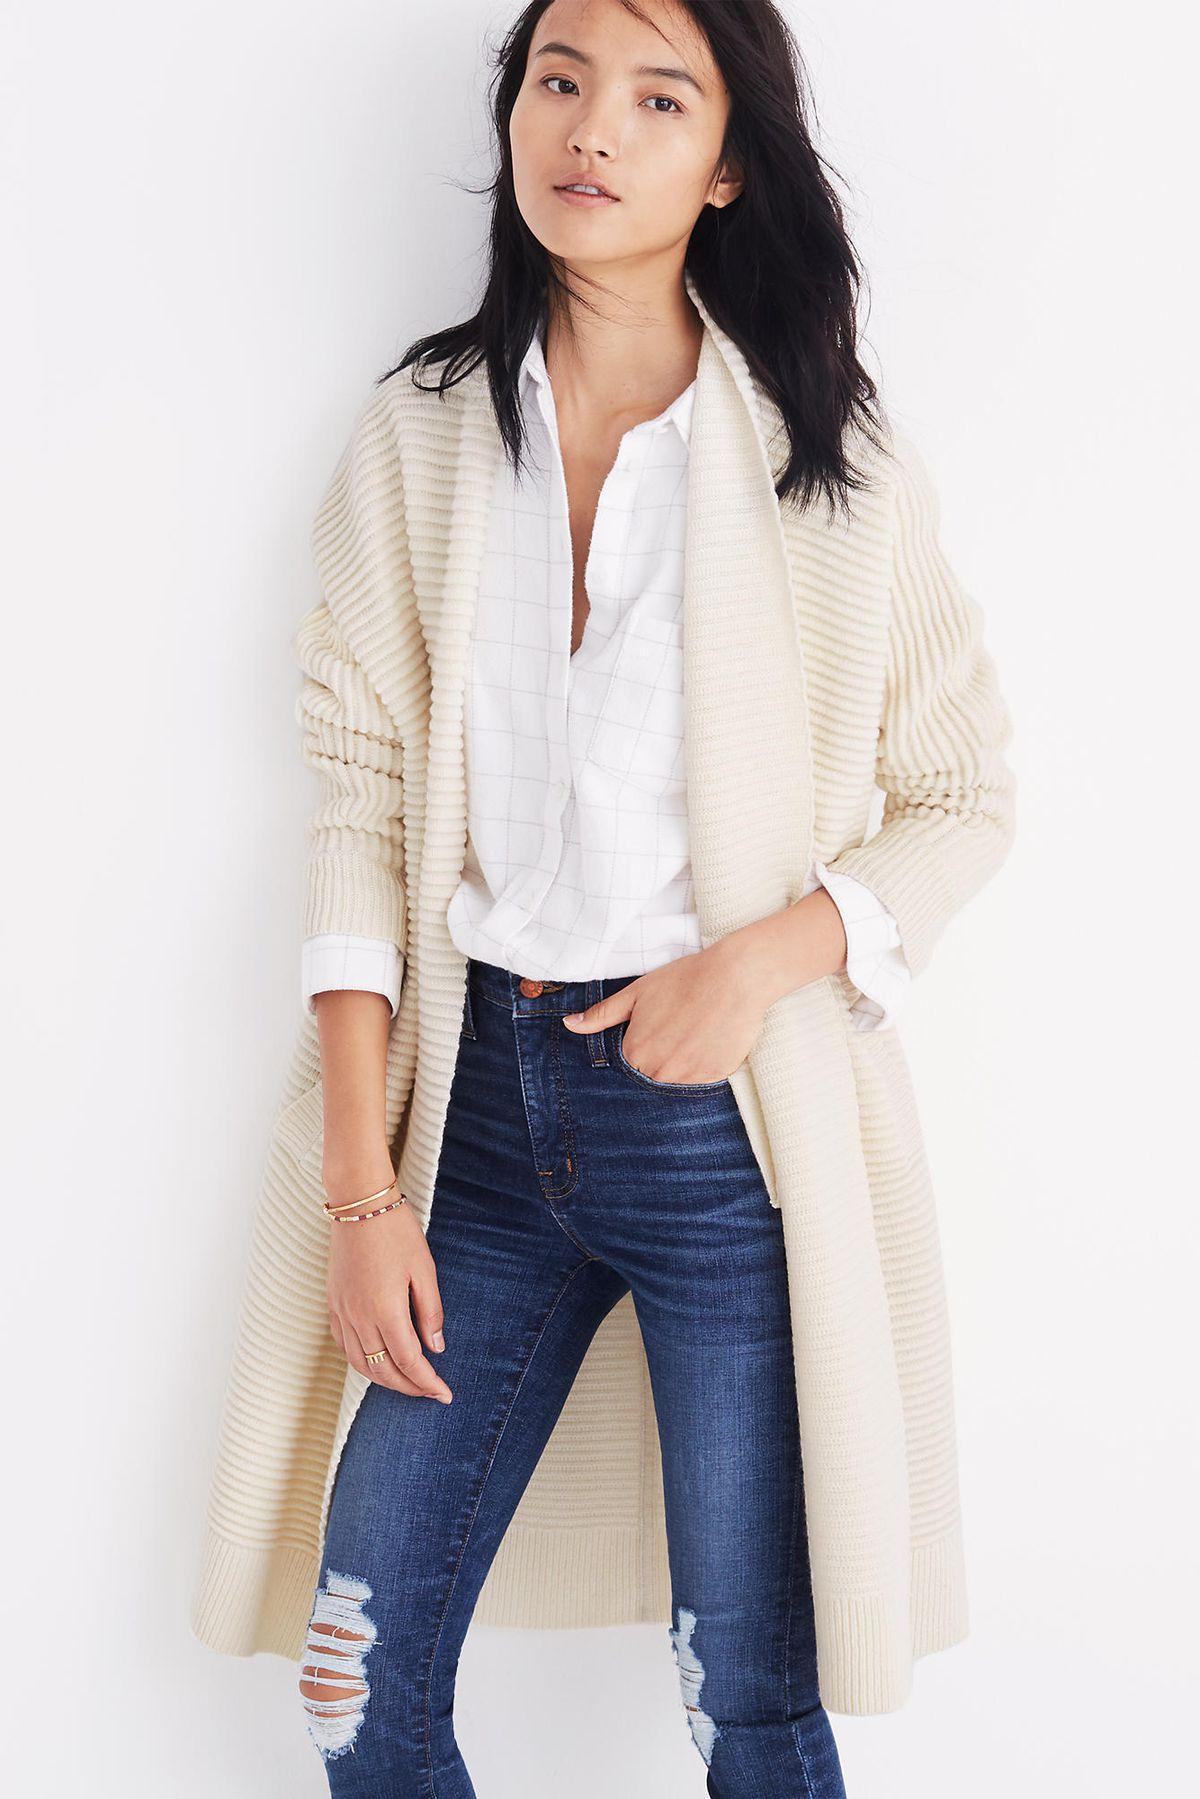 a white sweater coat